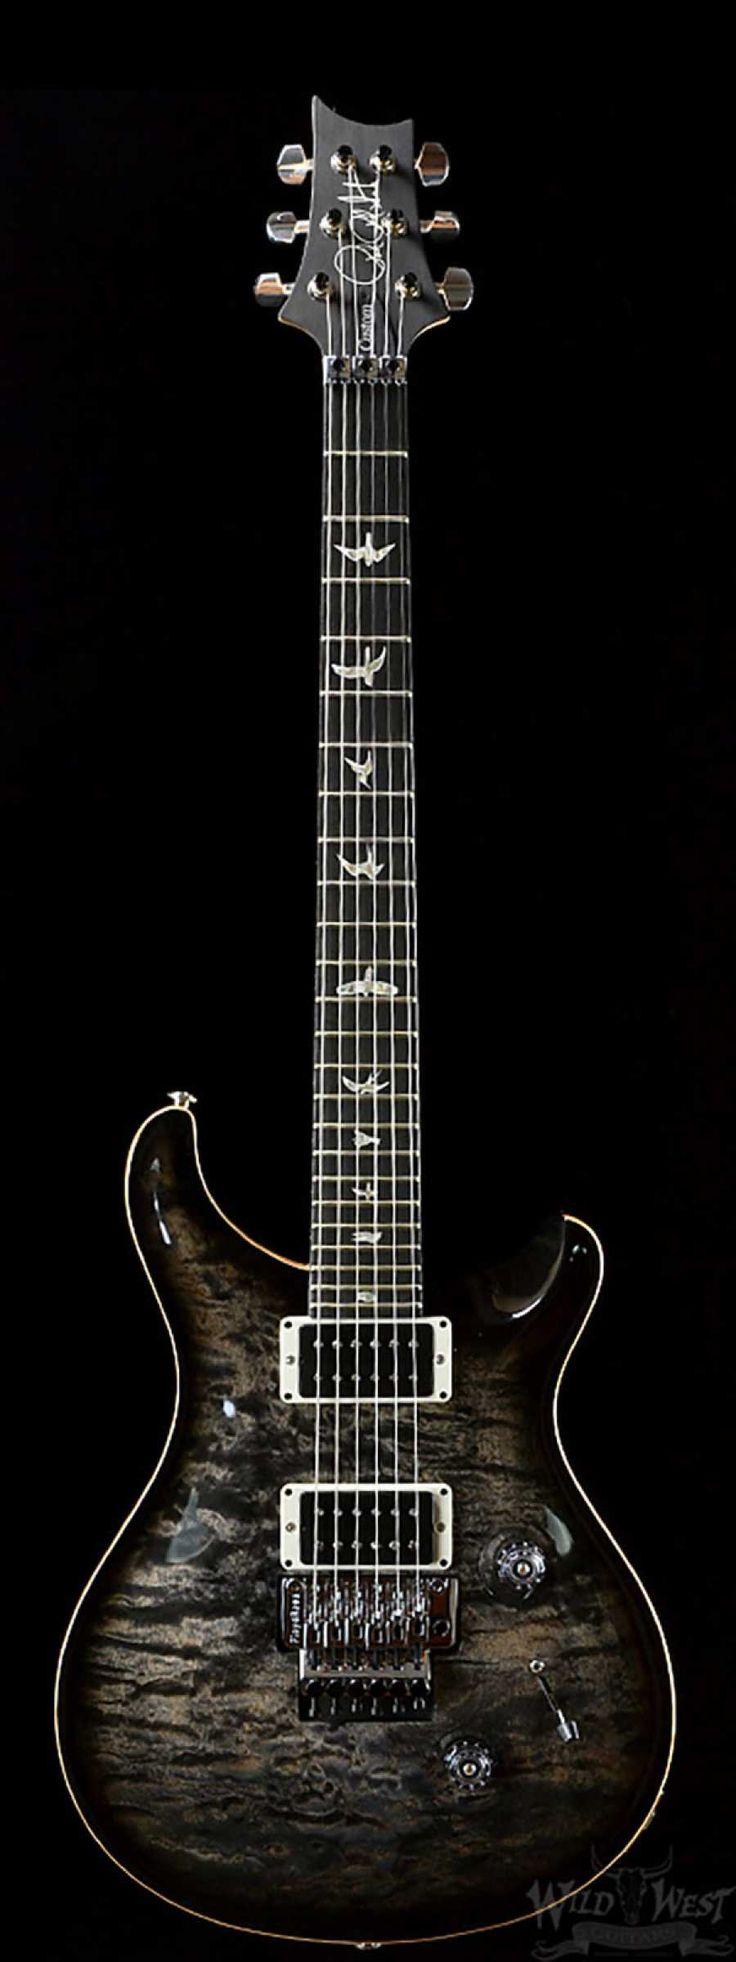 PRS Custom 24 Floyd Charcoal Burst 10 Top - Wild West Guitars